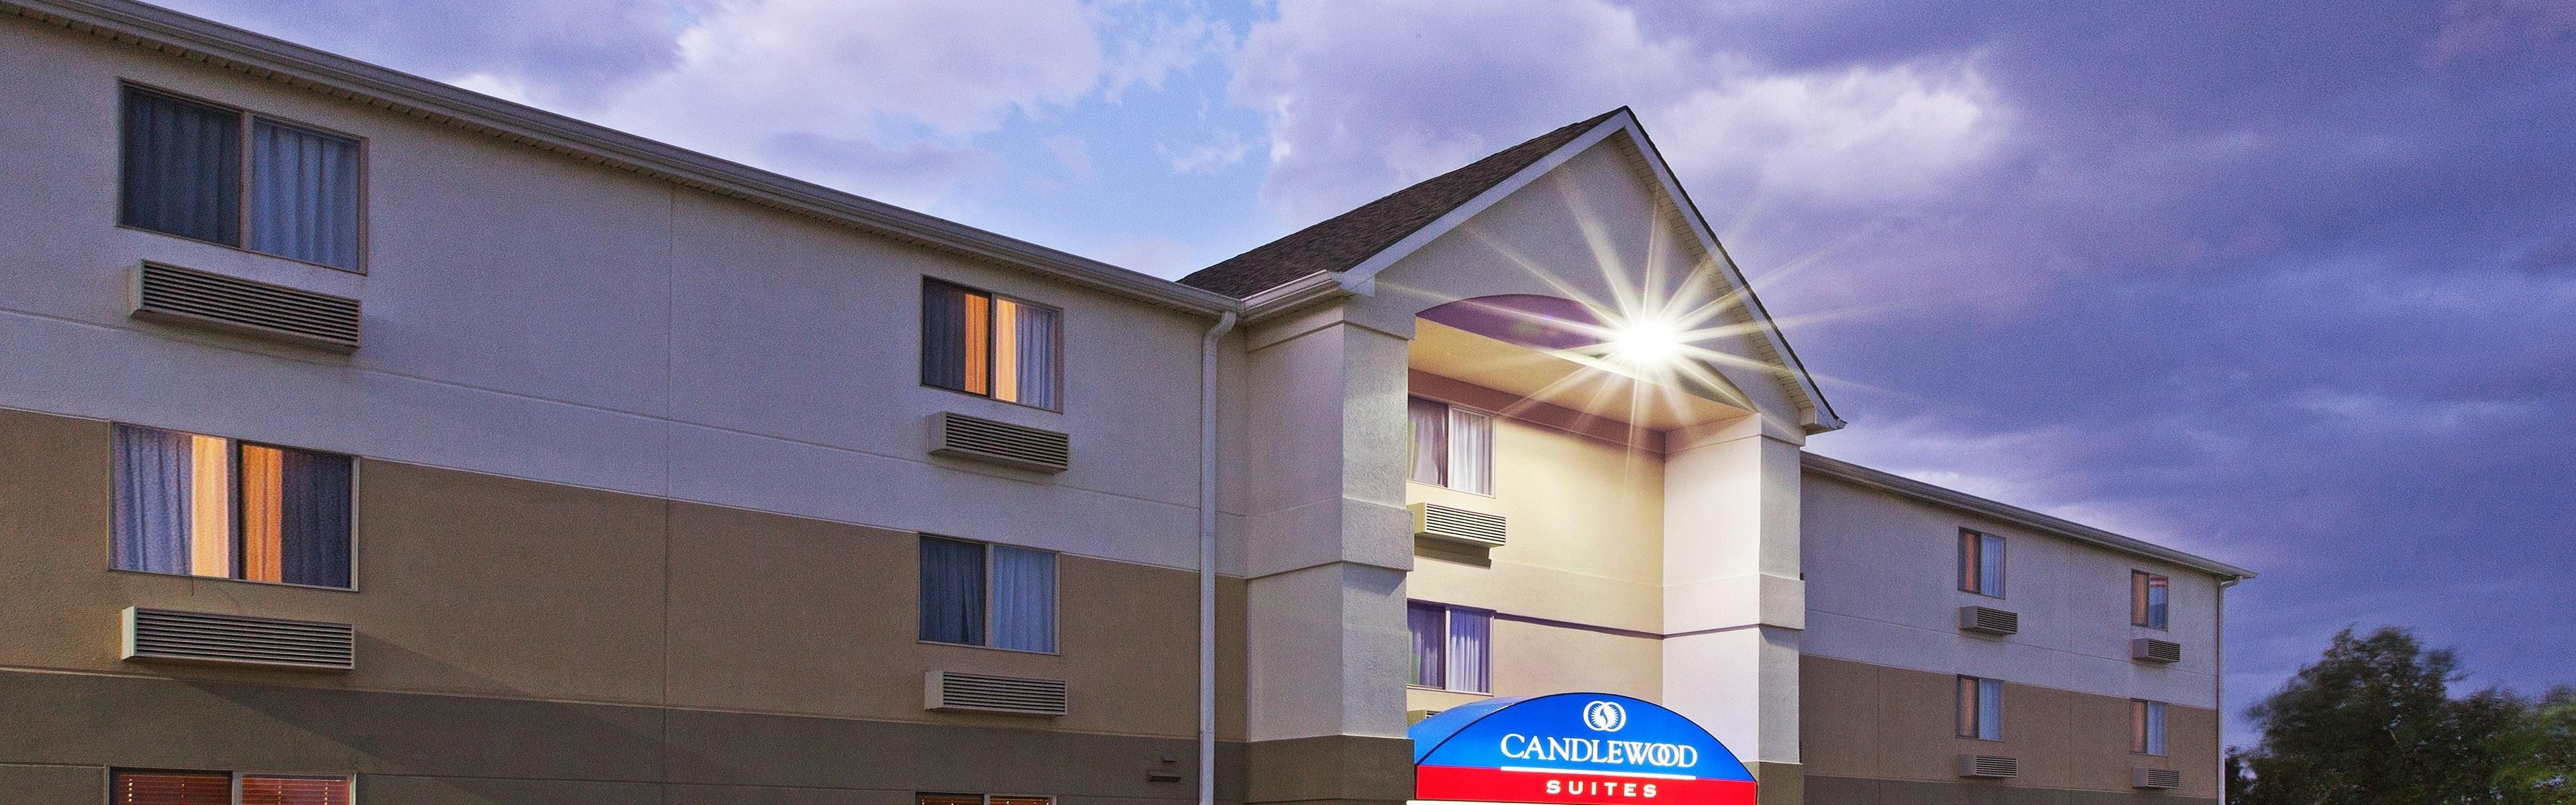 Candlewood Suites Wichita-Northeast image 0